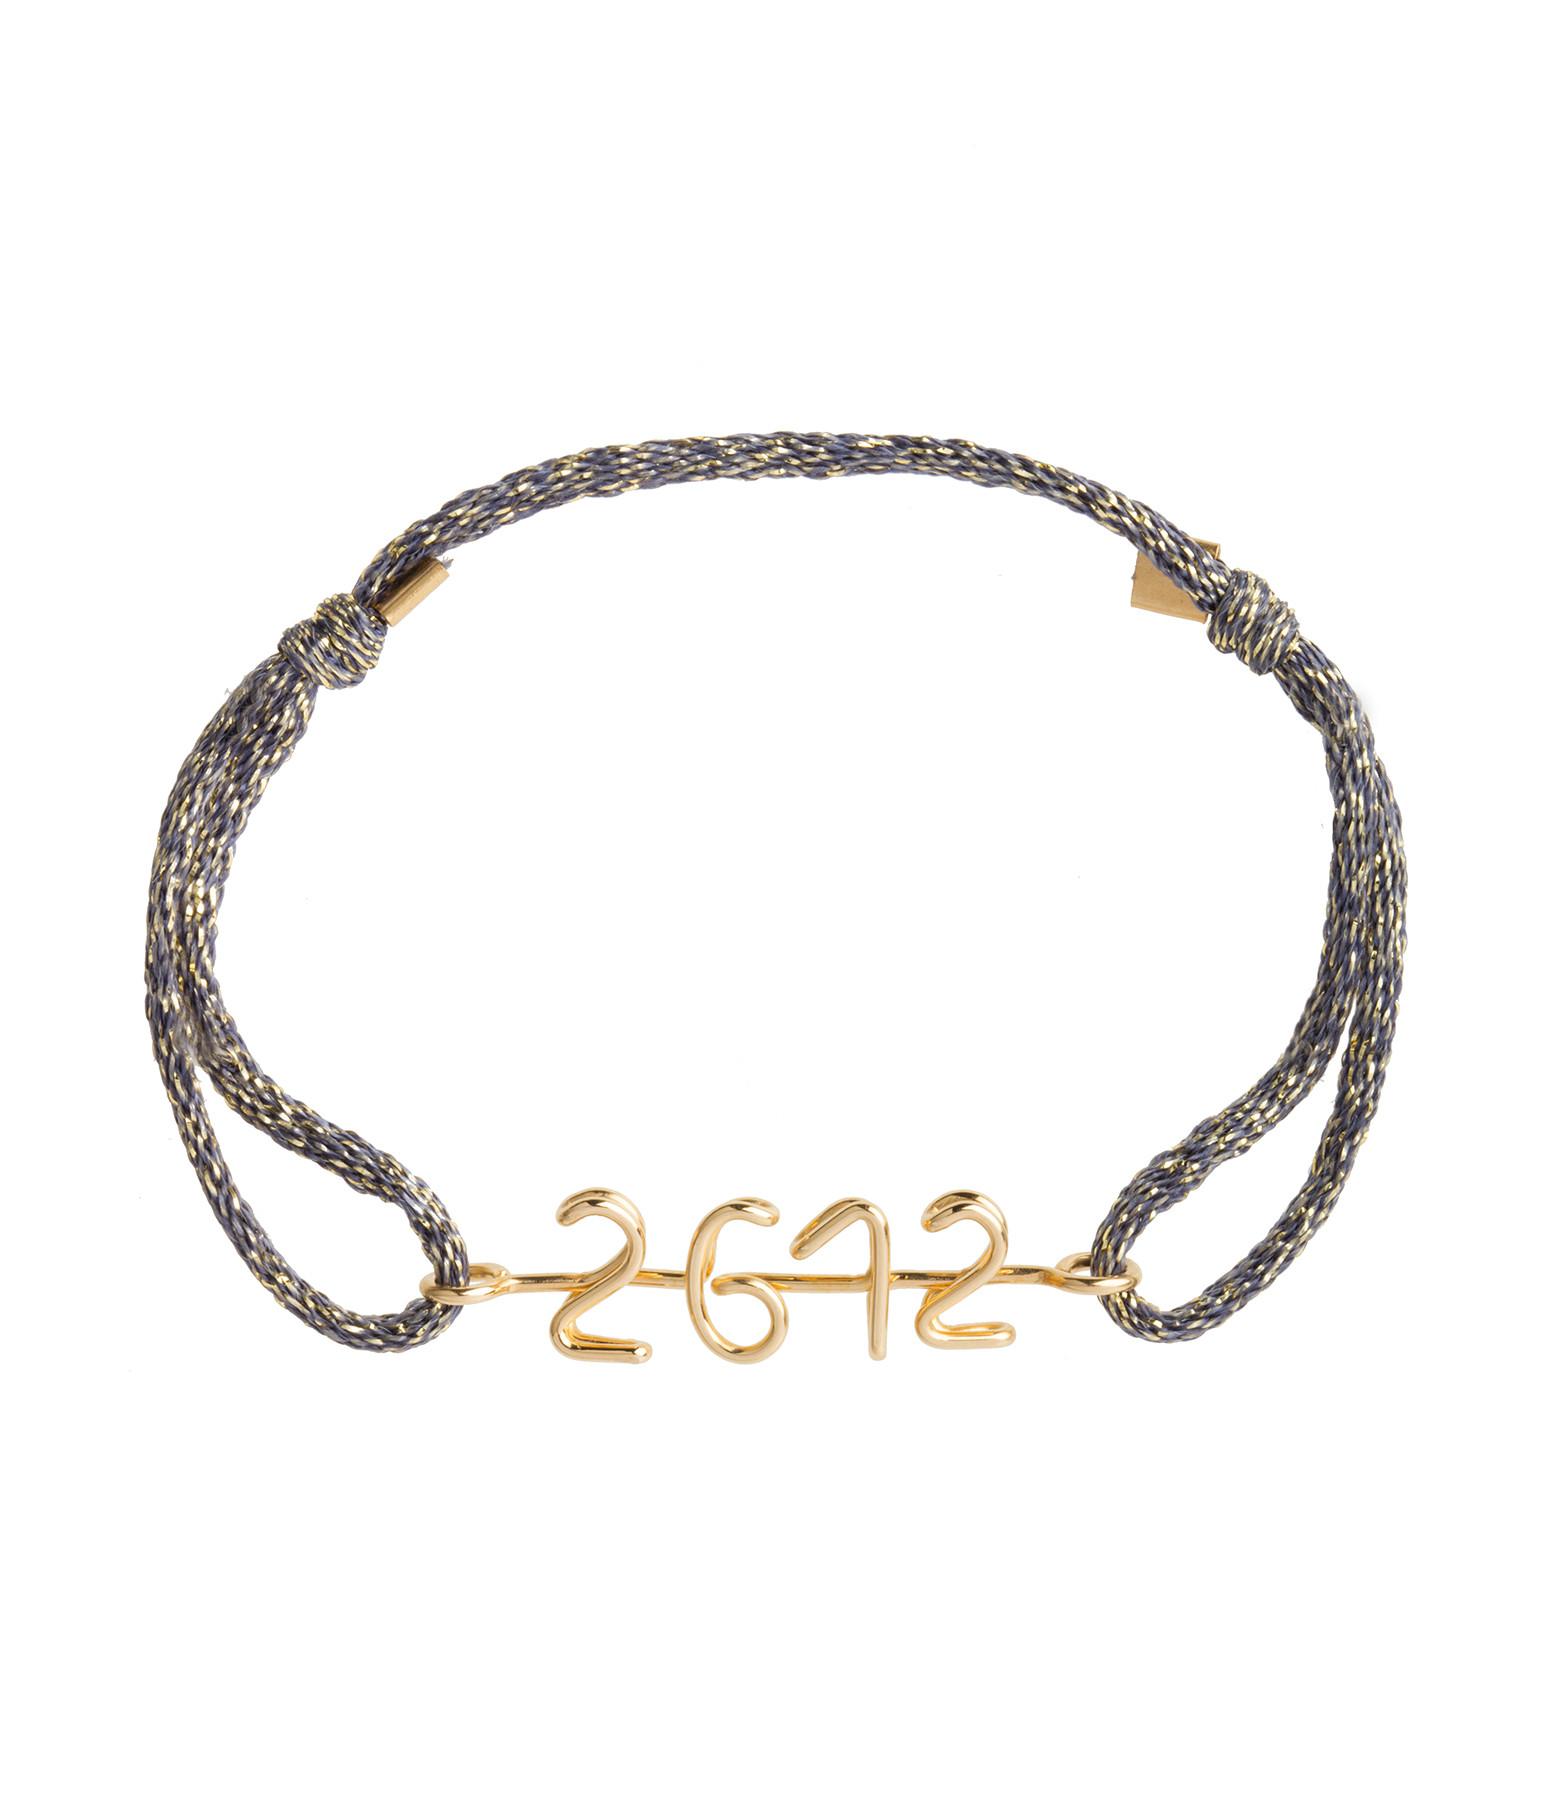 ATELIER PAULIN - Bracelet Original Le Temps Lurex GF14K